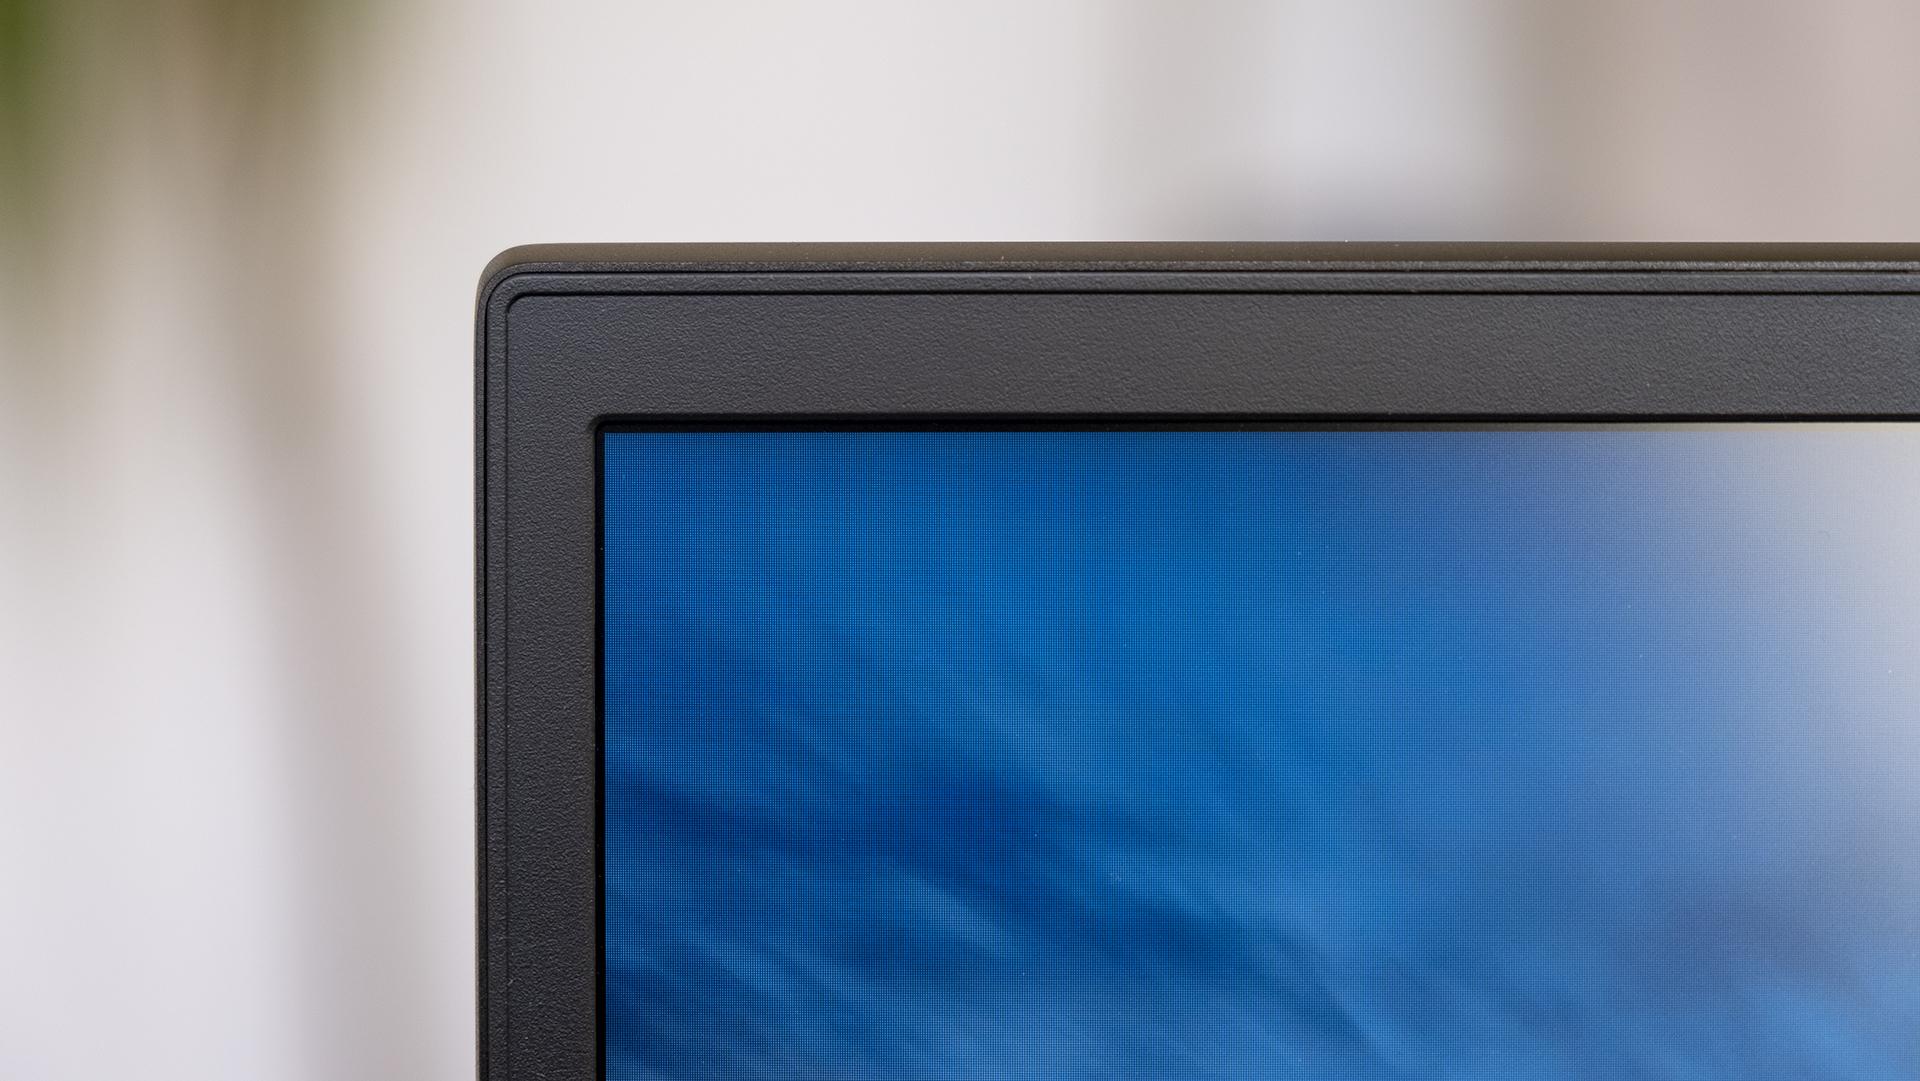 Lenovo ThinkPad E15 Display Ränder